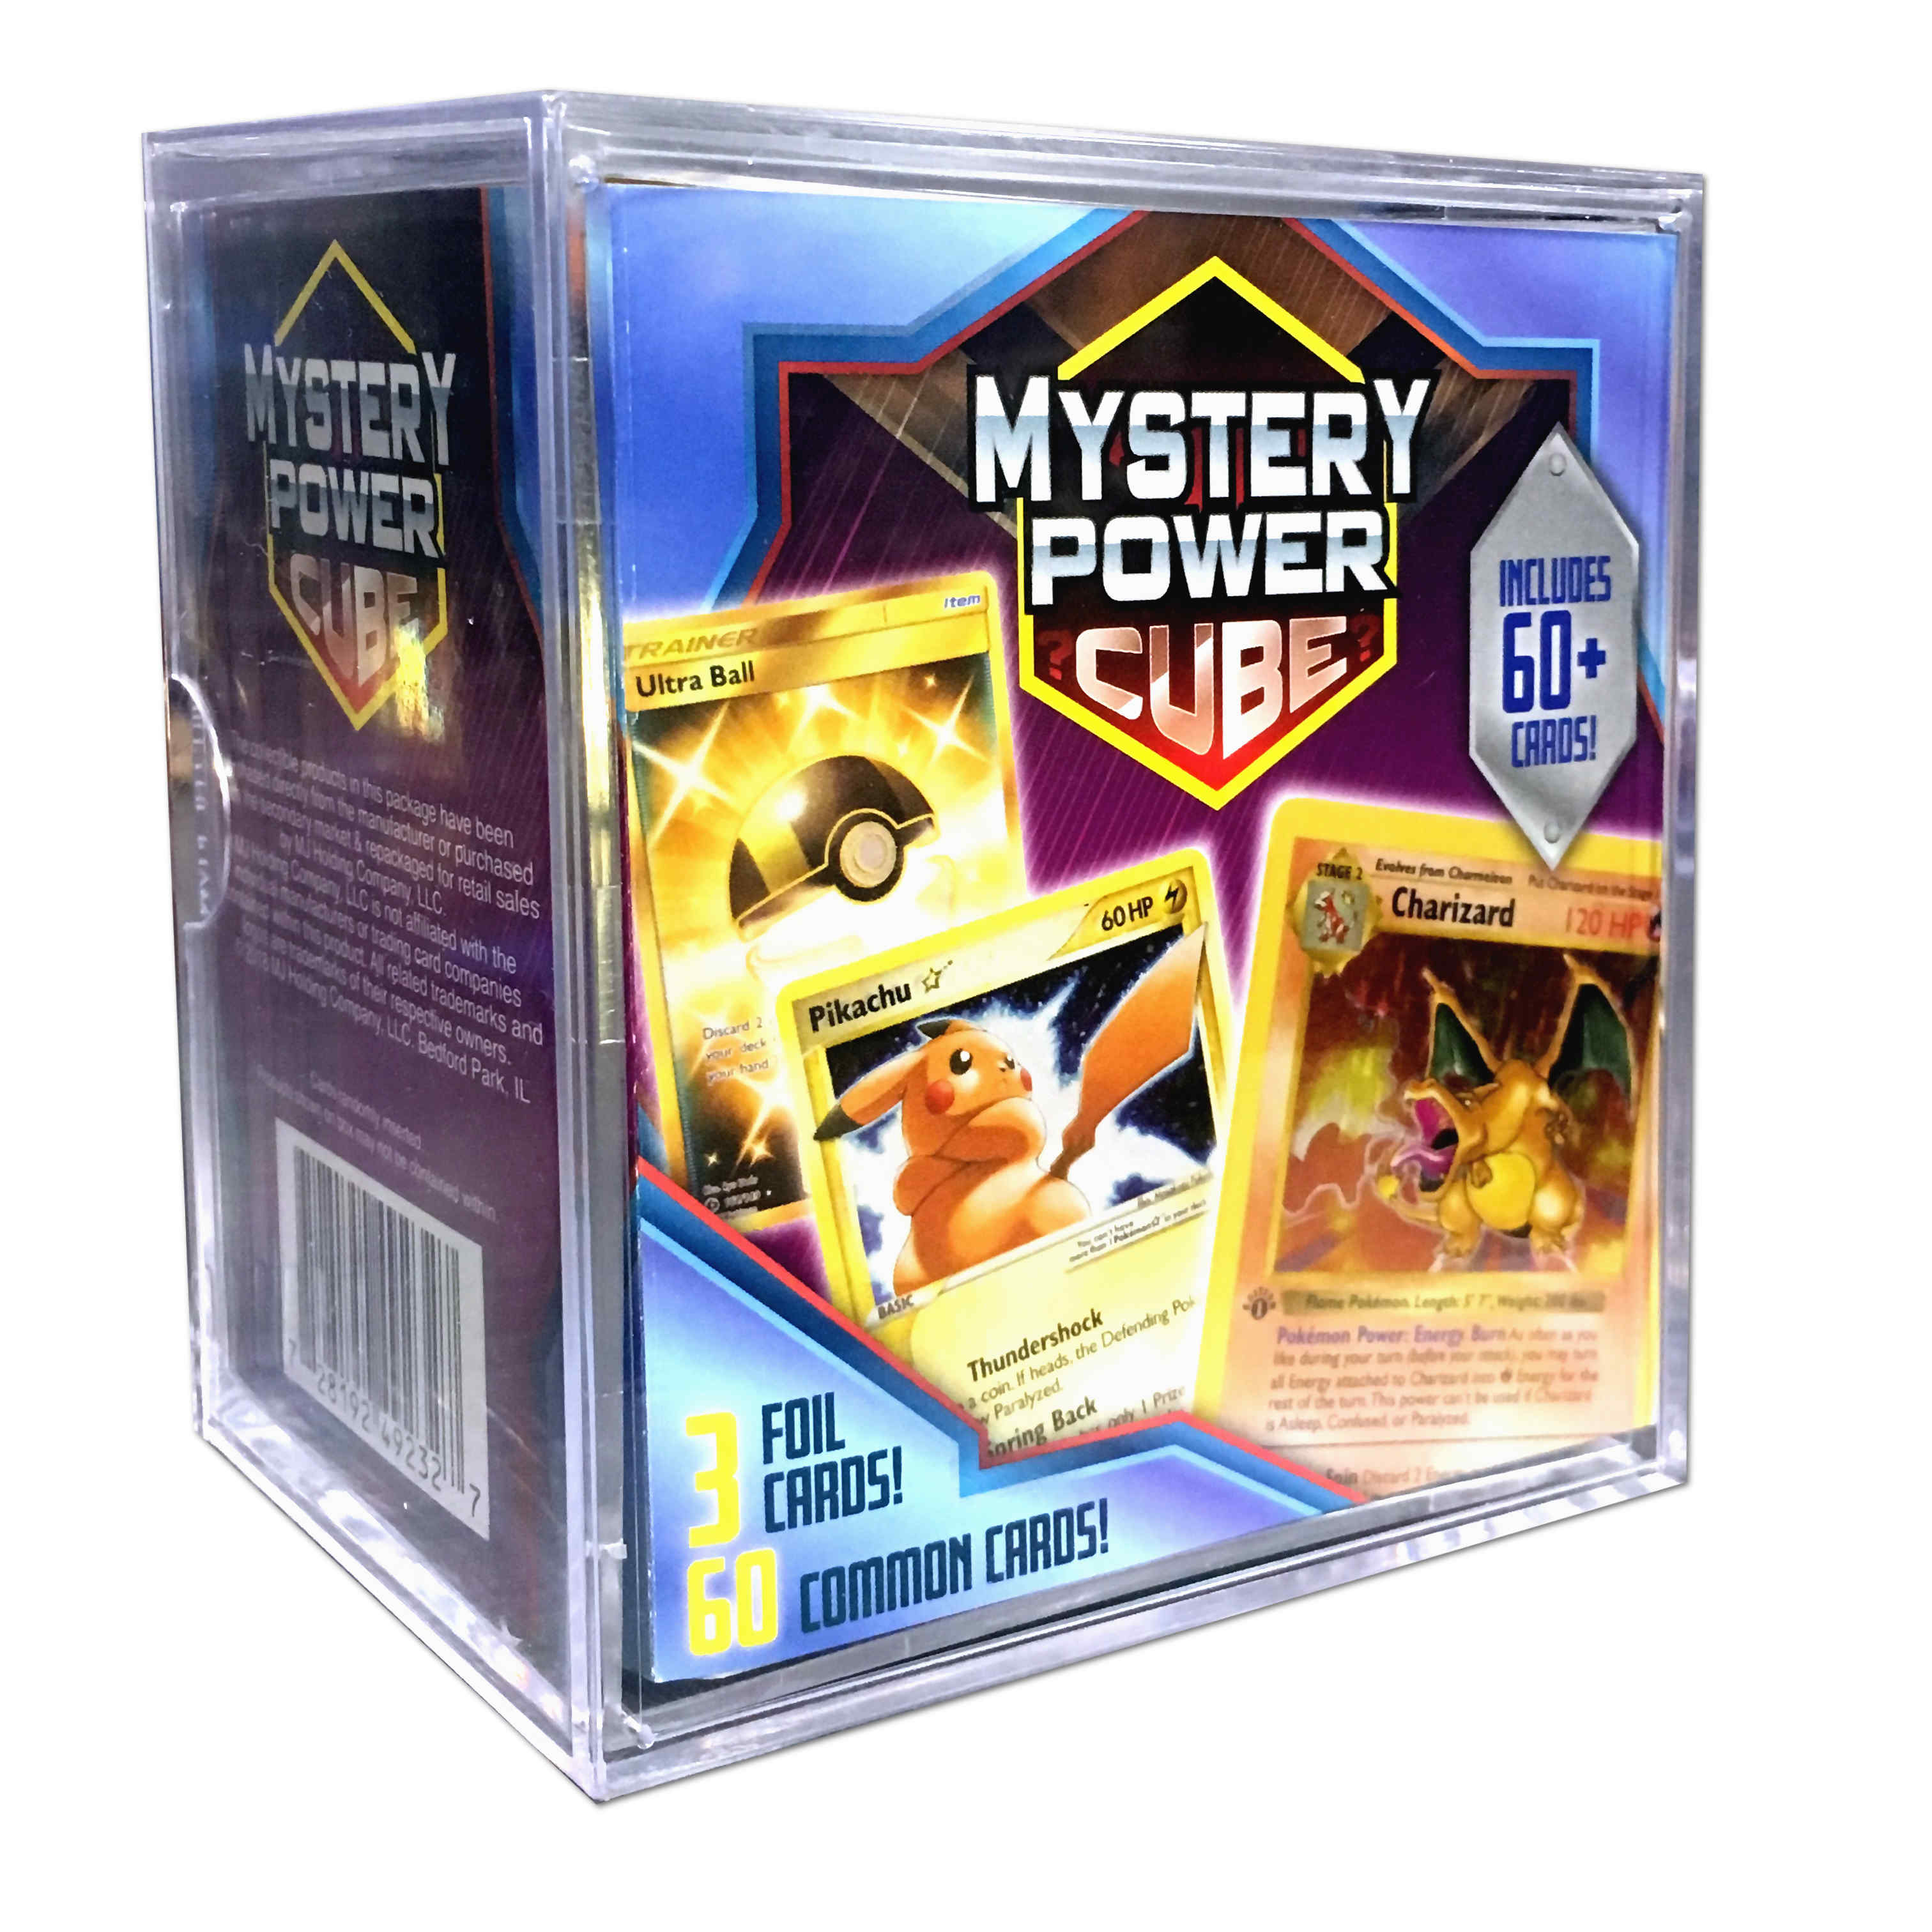 Pokemon Mystery Power Cube Trading Cards